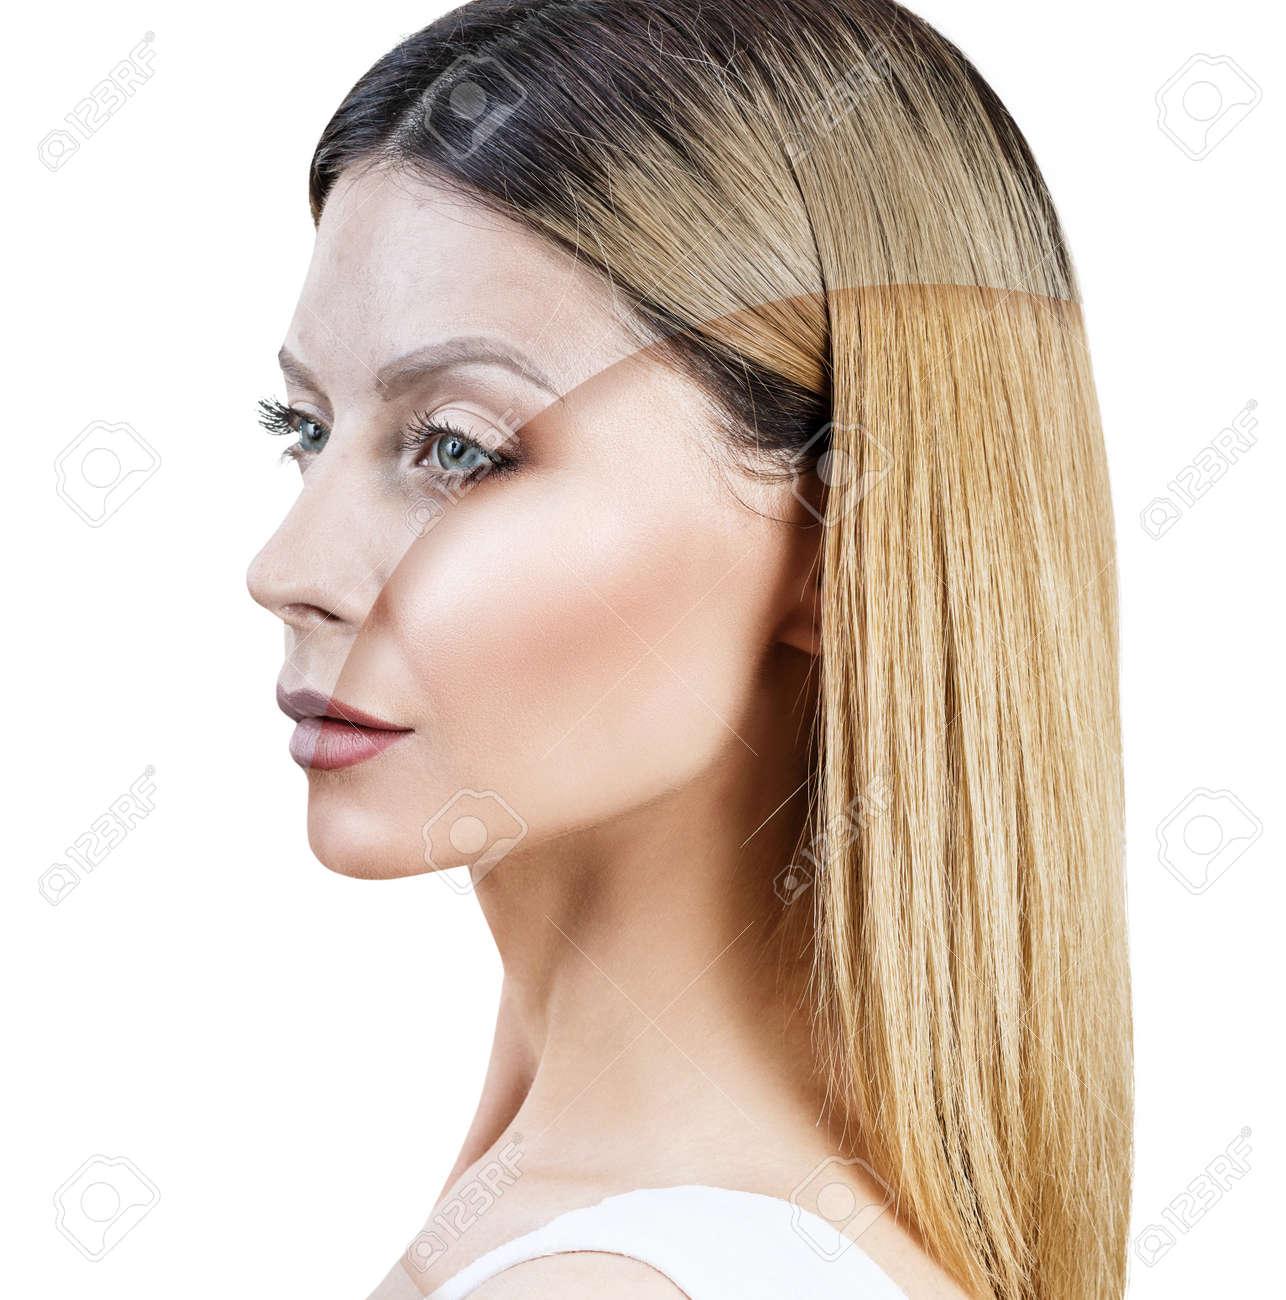 Acne adult female treatment